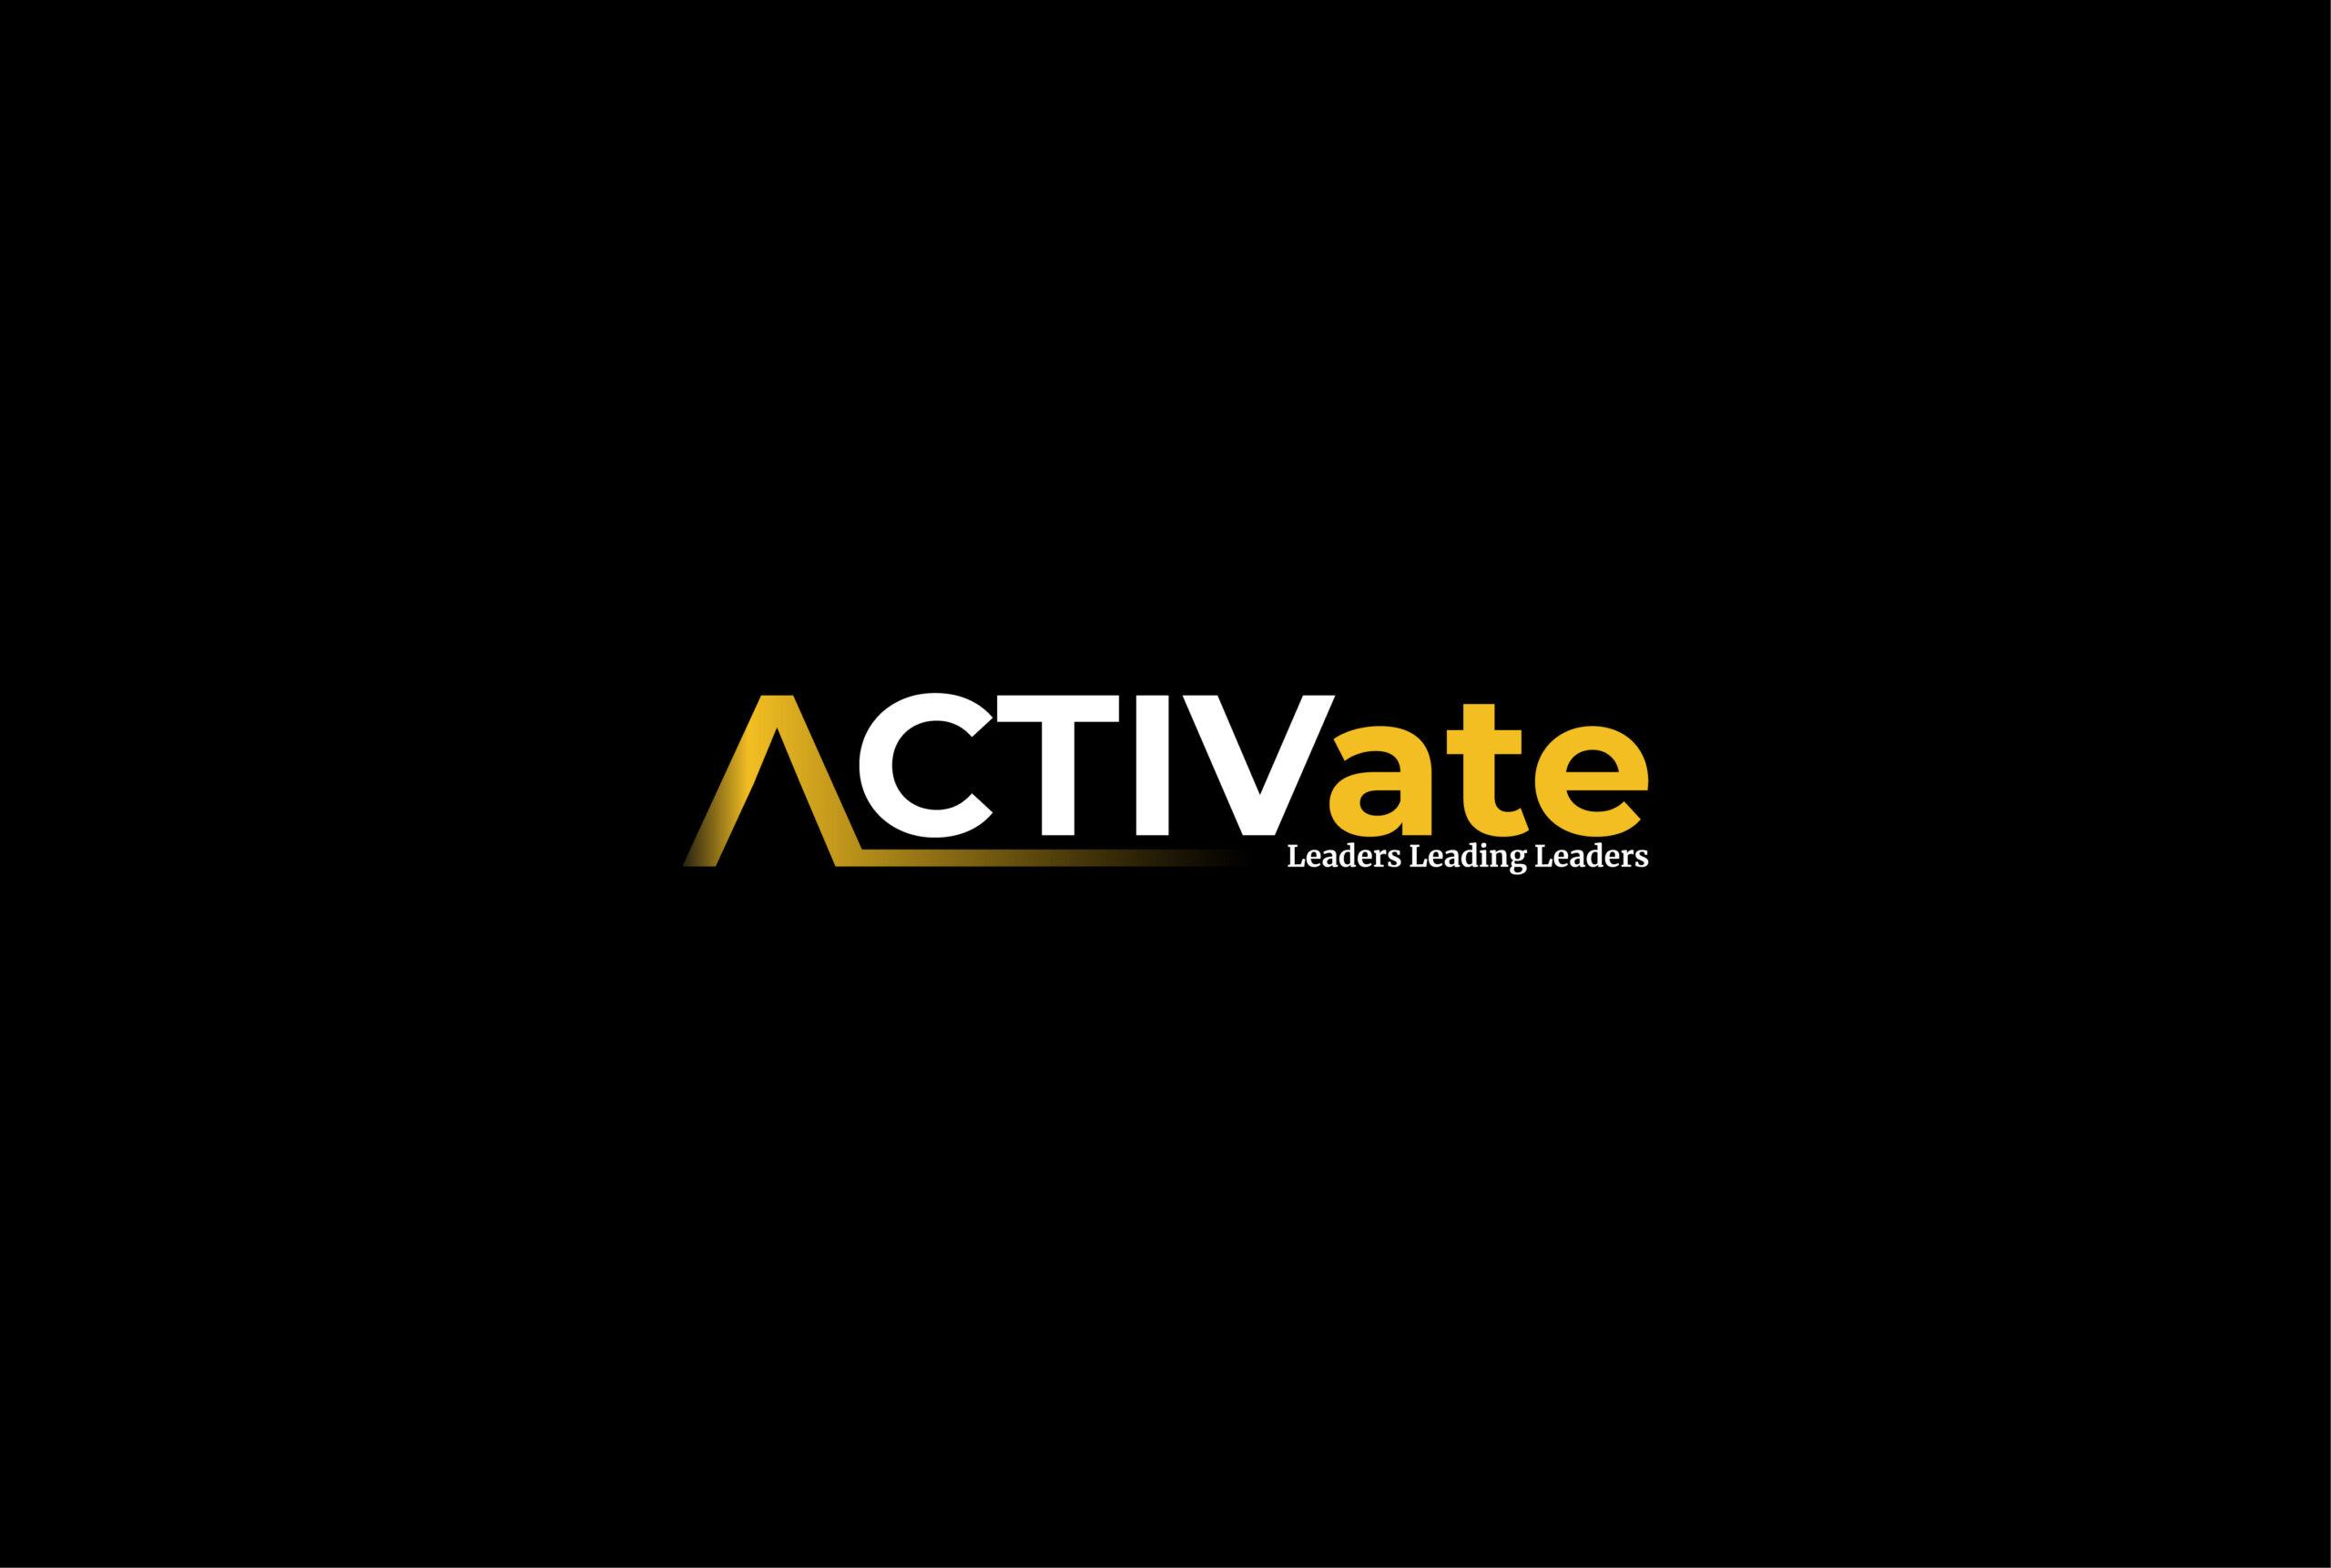 Activate Logo Yladrea Drummond Southern University Partner